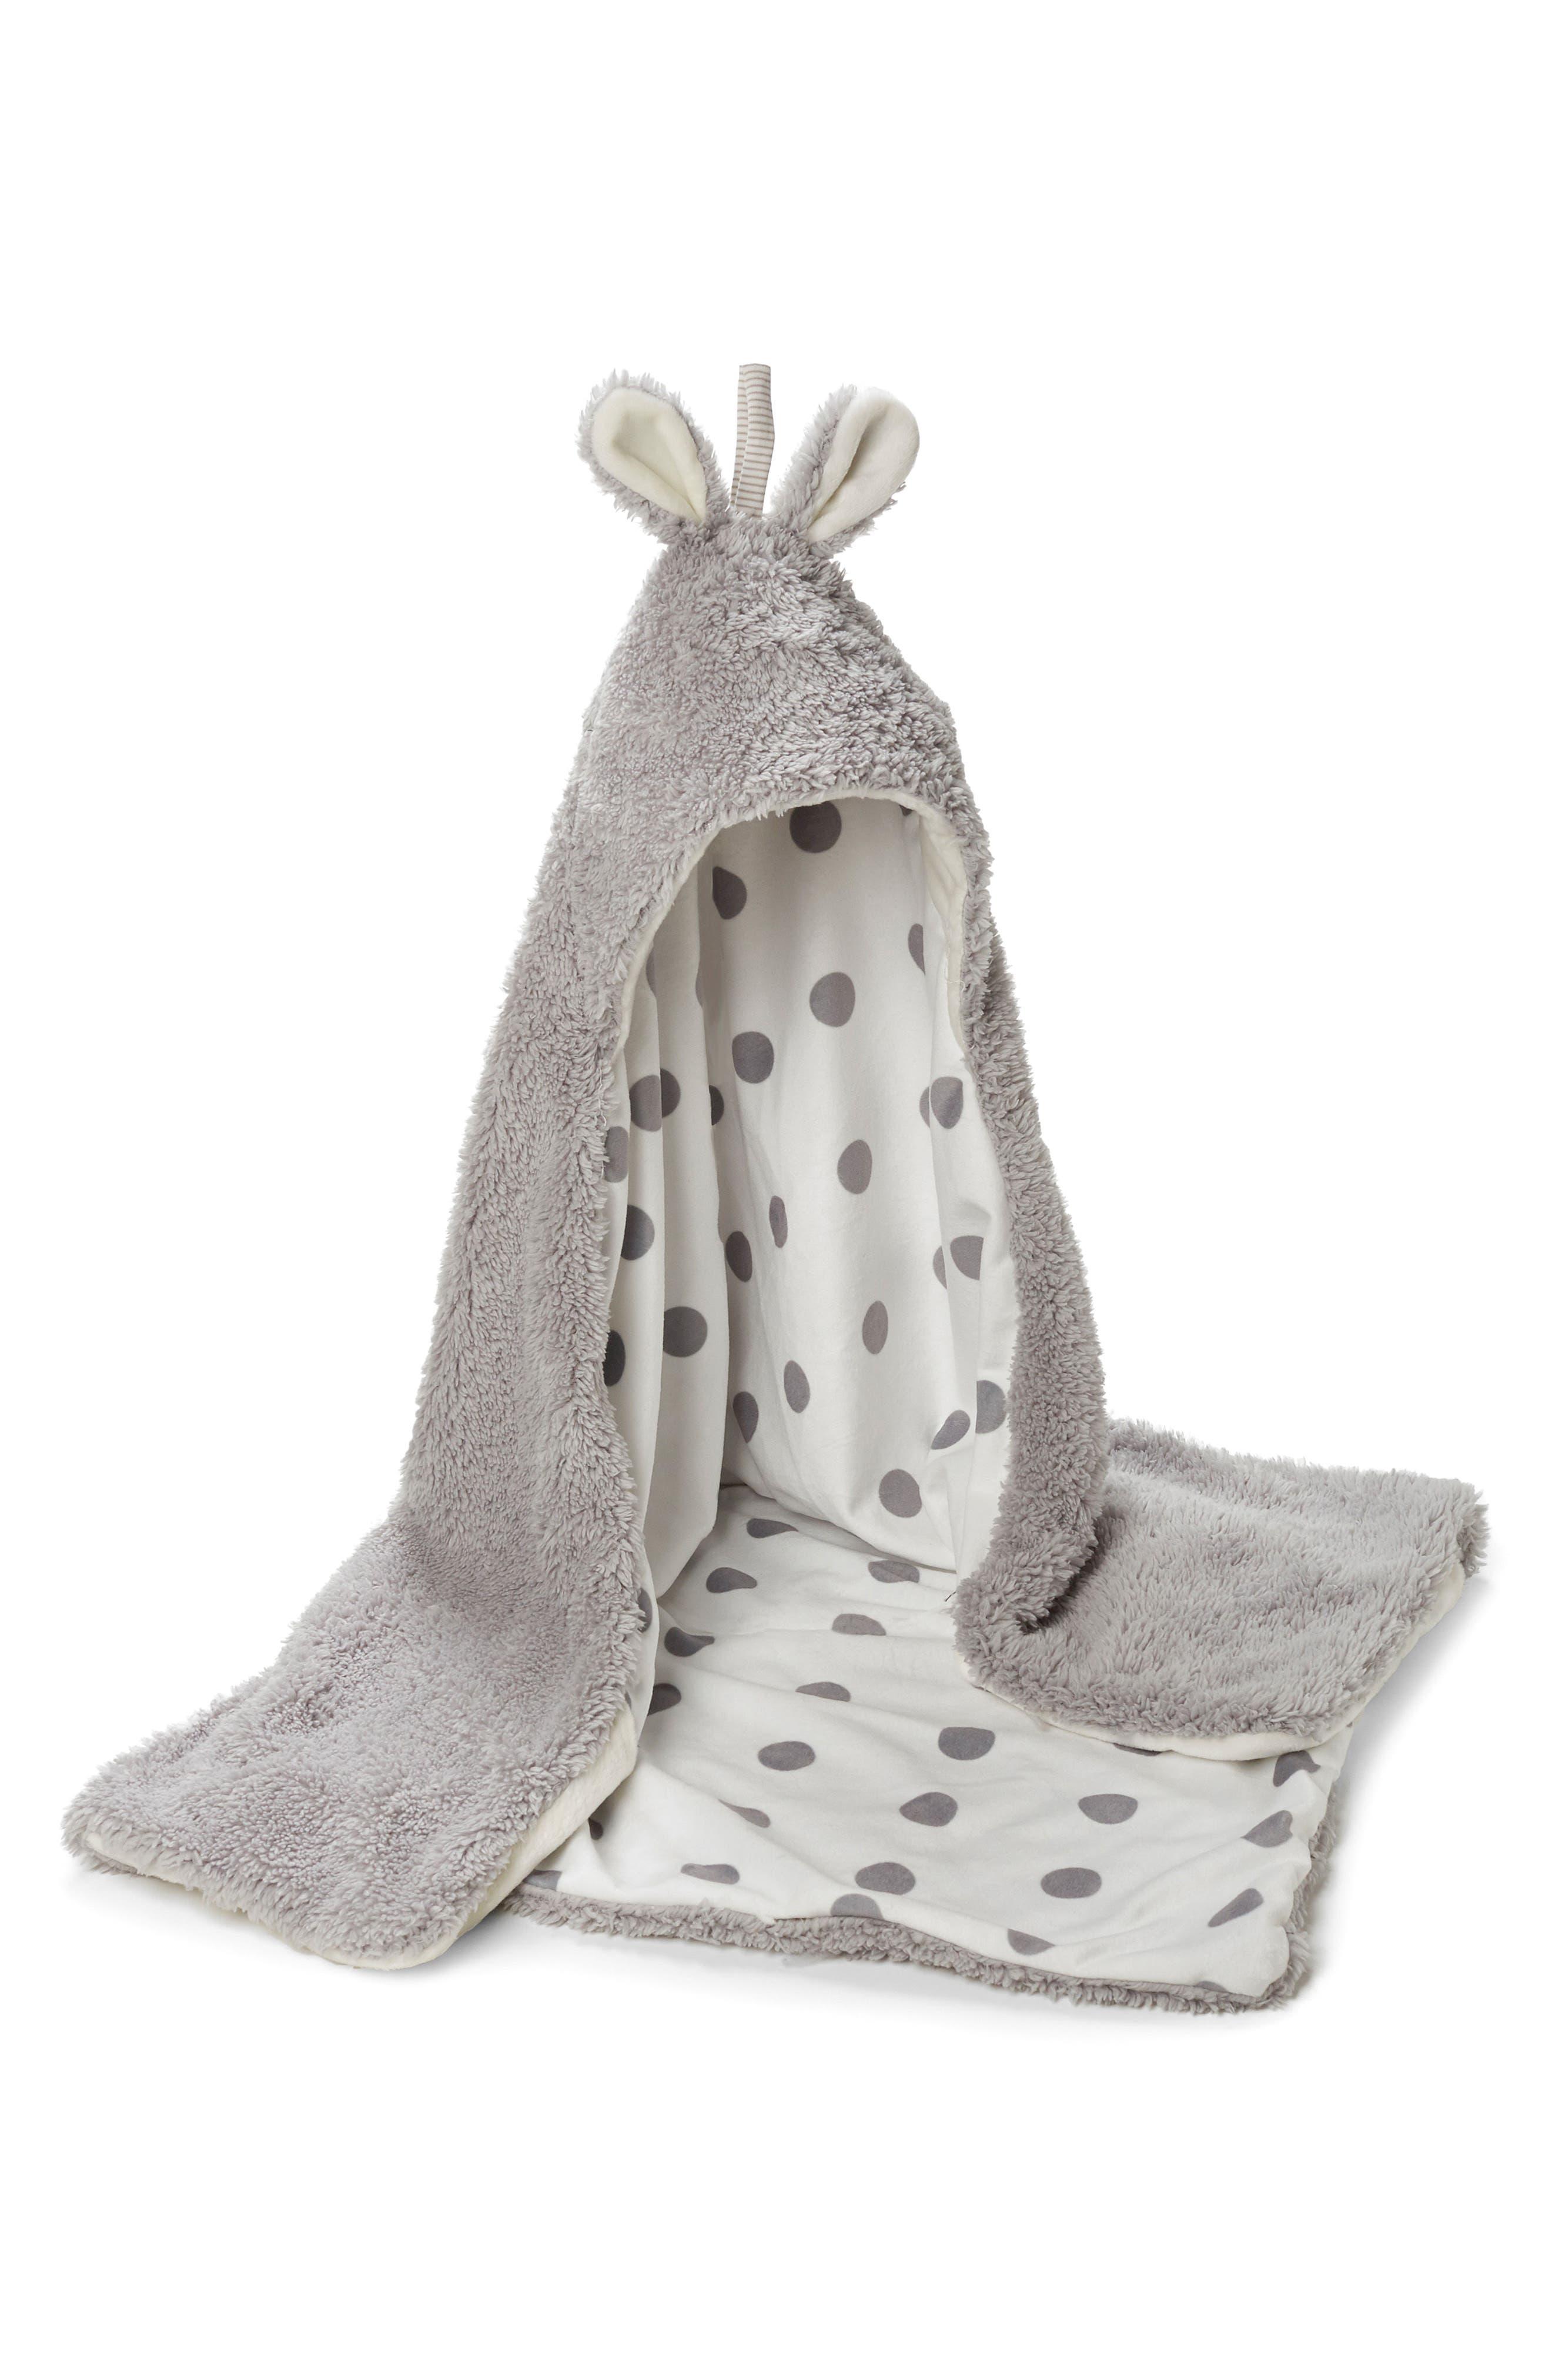 Bunny Hooded Blanket,                             Main thumbnail 1, color,                             Grady Grey